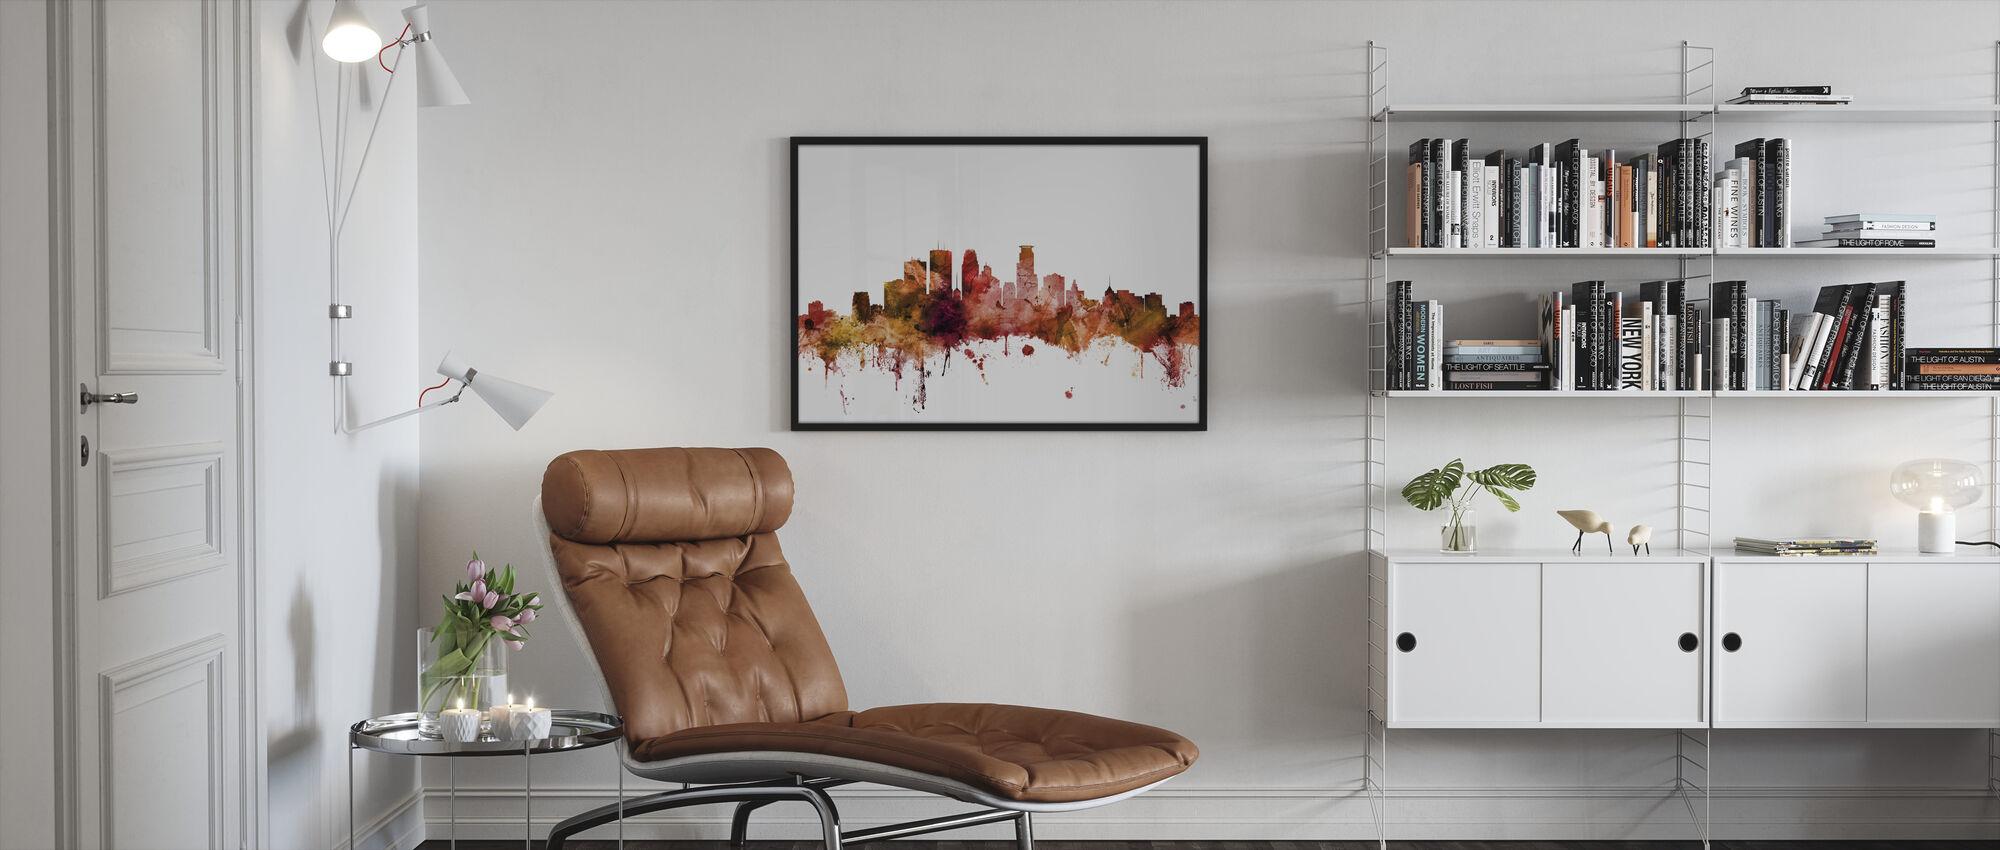 Minneapolis Minnesota Skyline - Framed print - Living Room